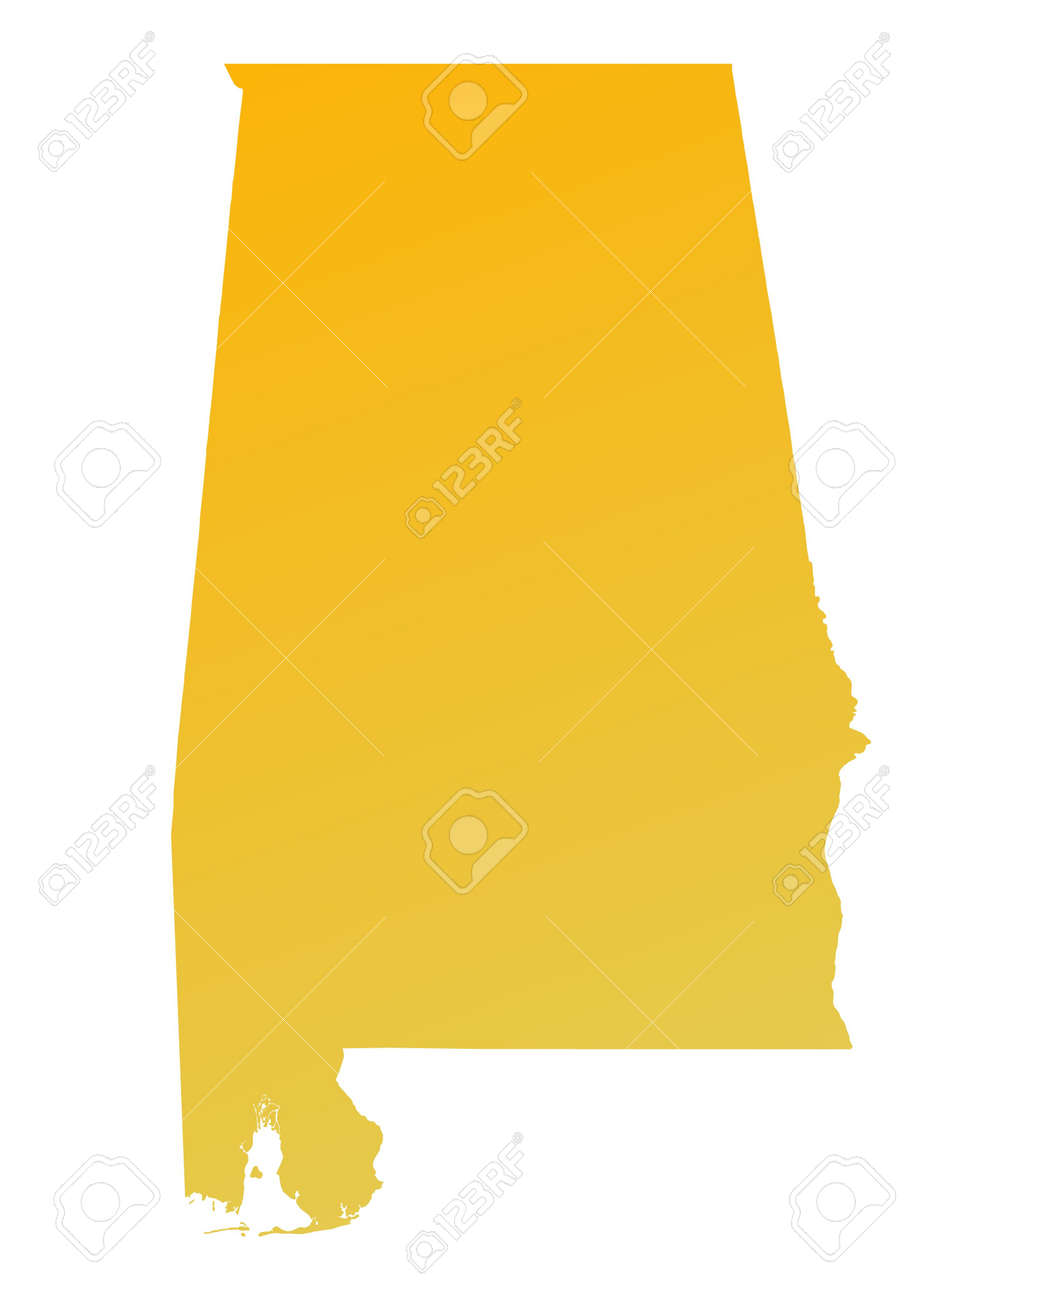 Orange Gradient Alabama Map USA Detailed Mercator Projection - Map usa alabama